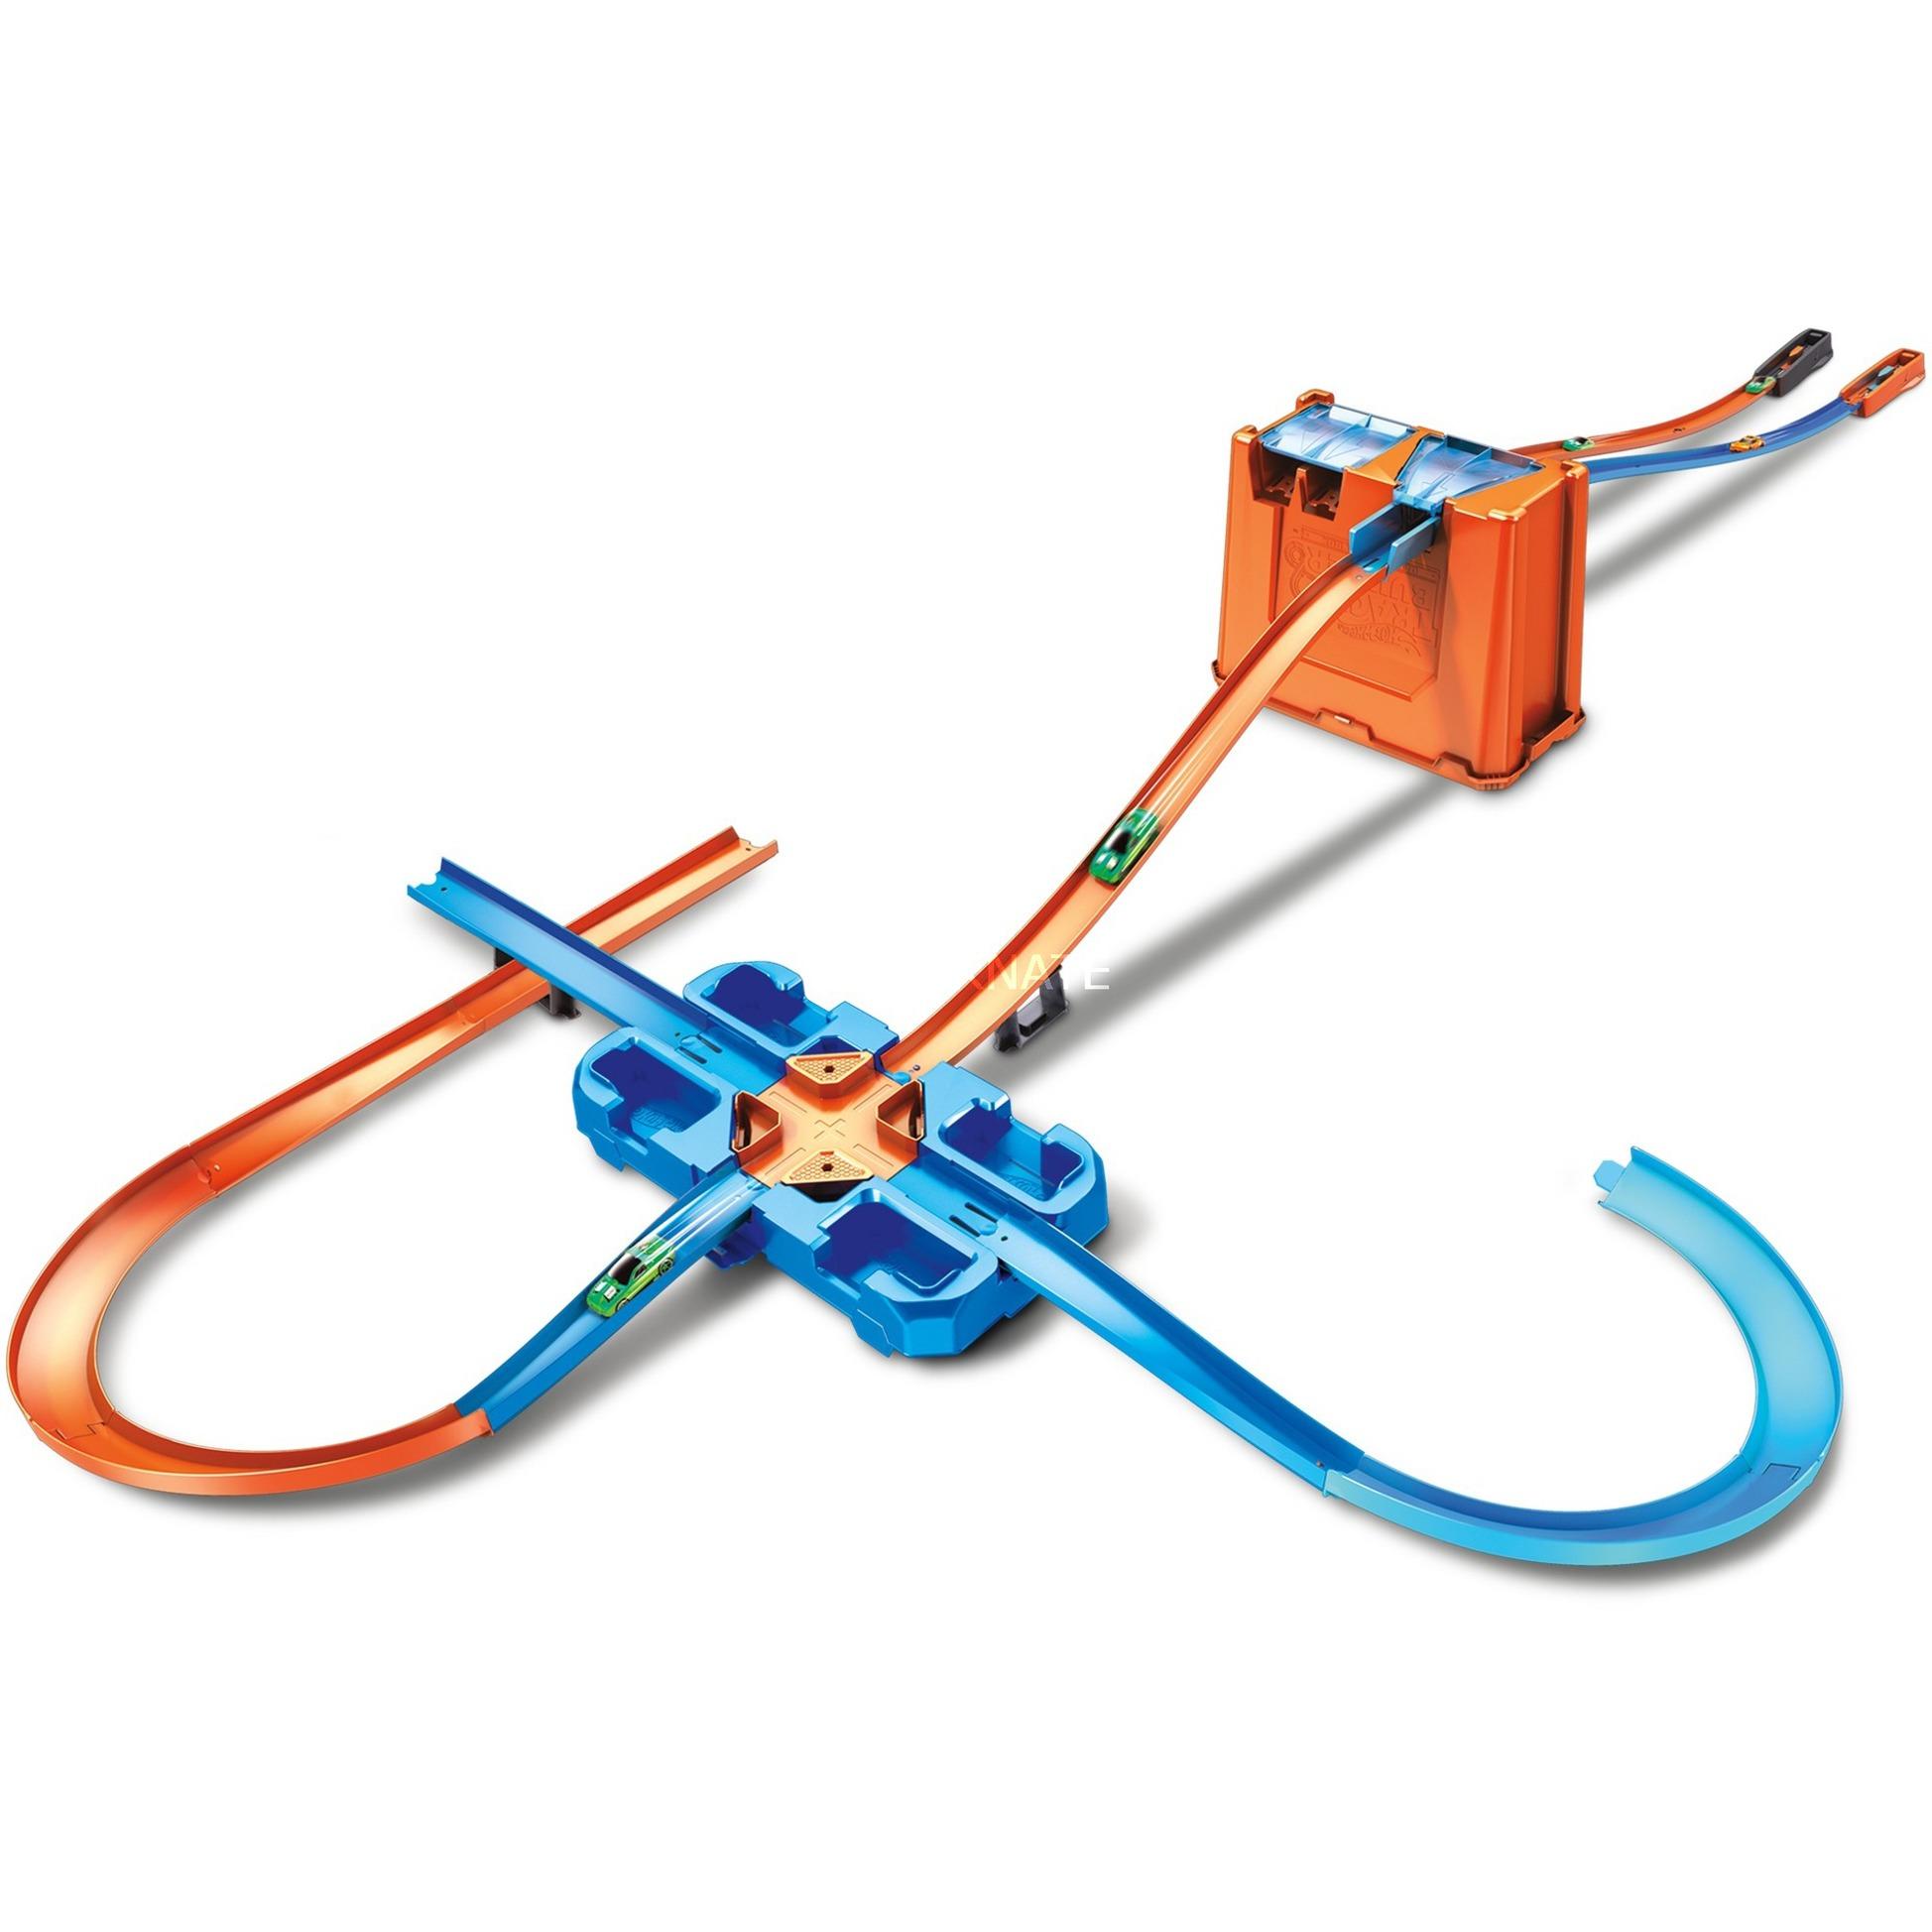 GGP93 accesorio para juguetes, Pistas de carreras